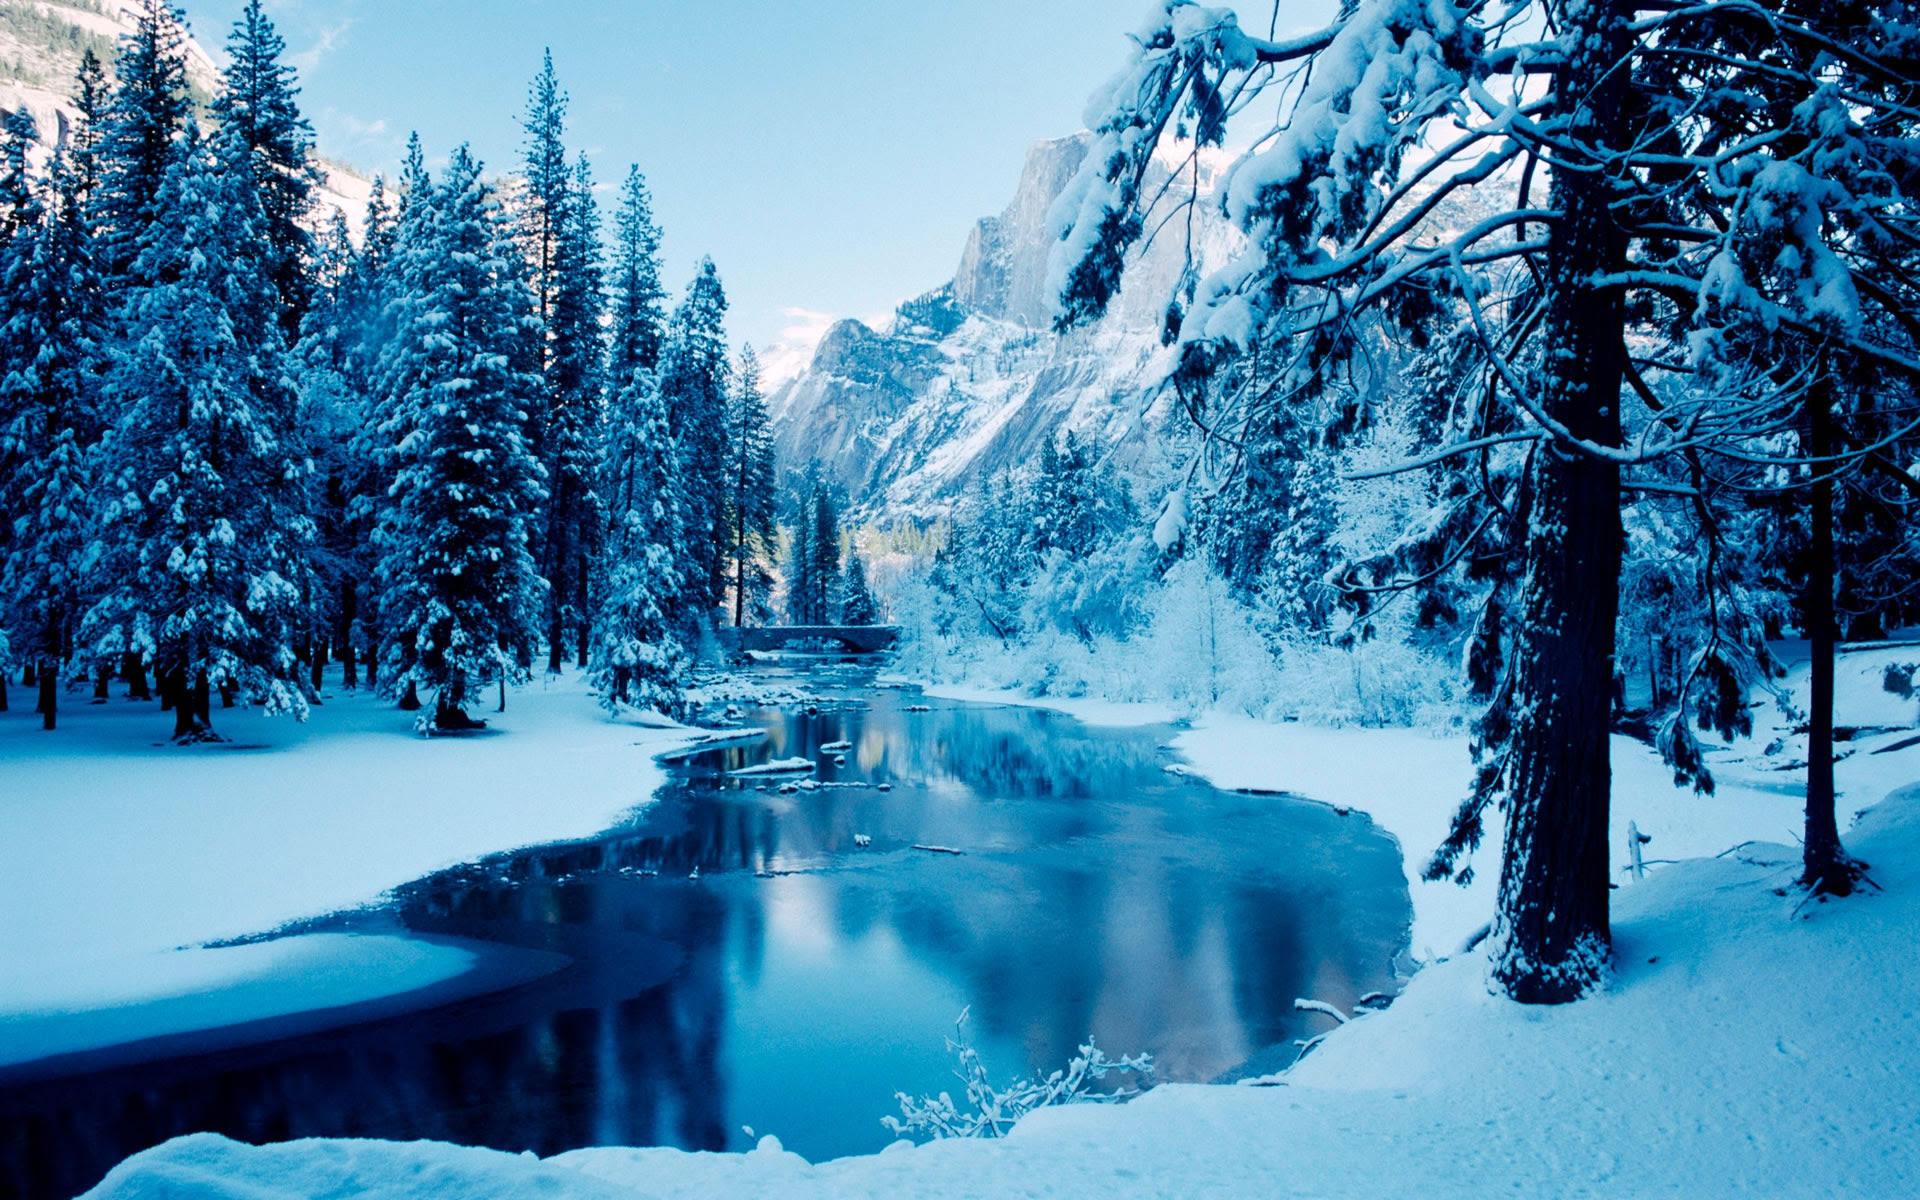 winter wallpaper for desktop  HD Desktop Wallpapers  4k HD